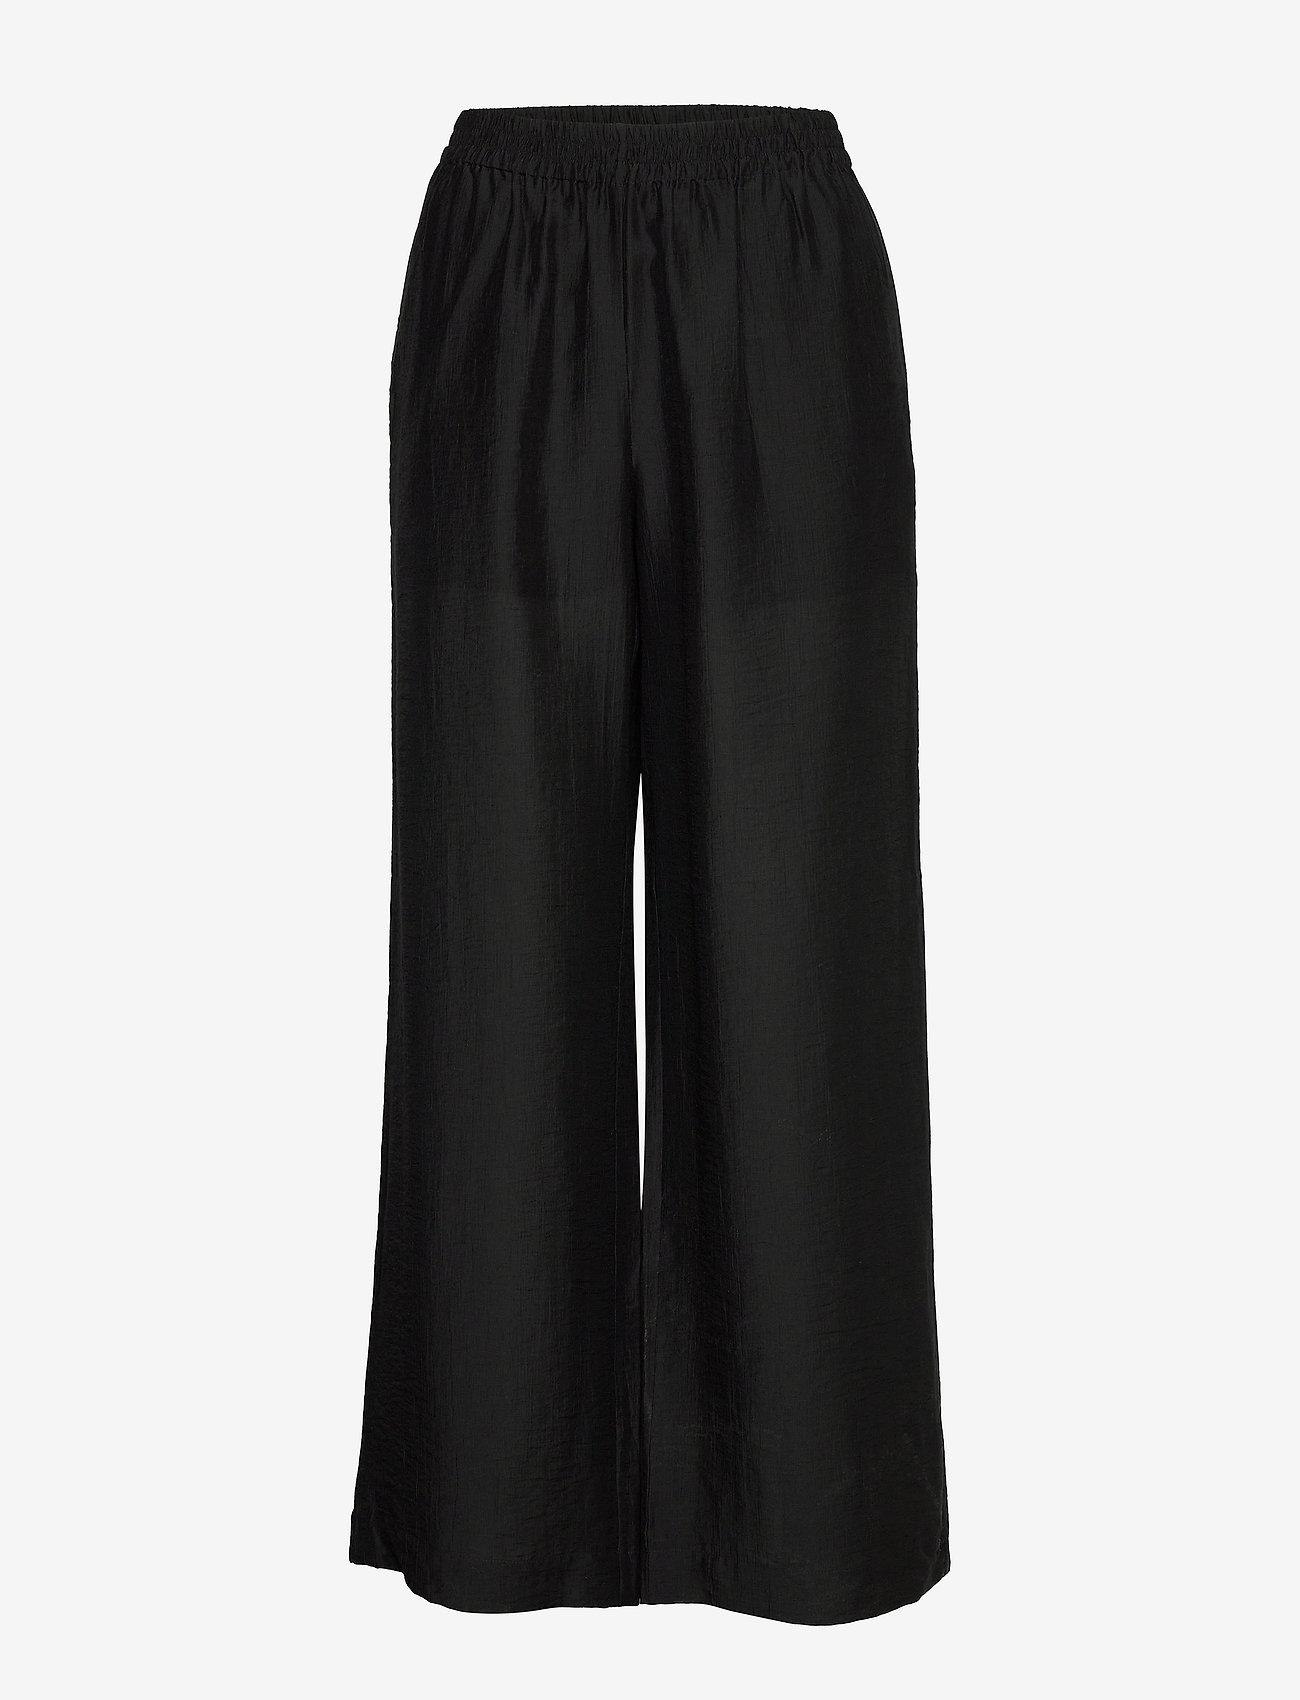 Twist & Tango - Franny Trousers - bukser med brede ben - black - 1